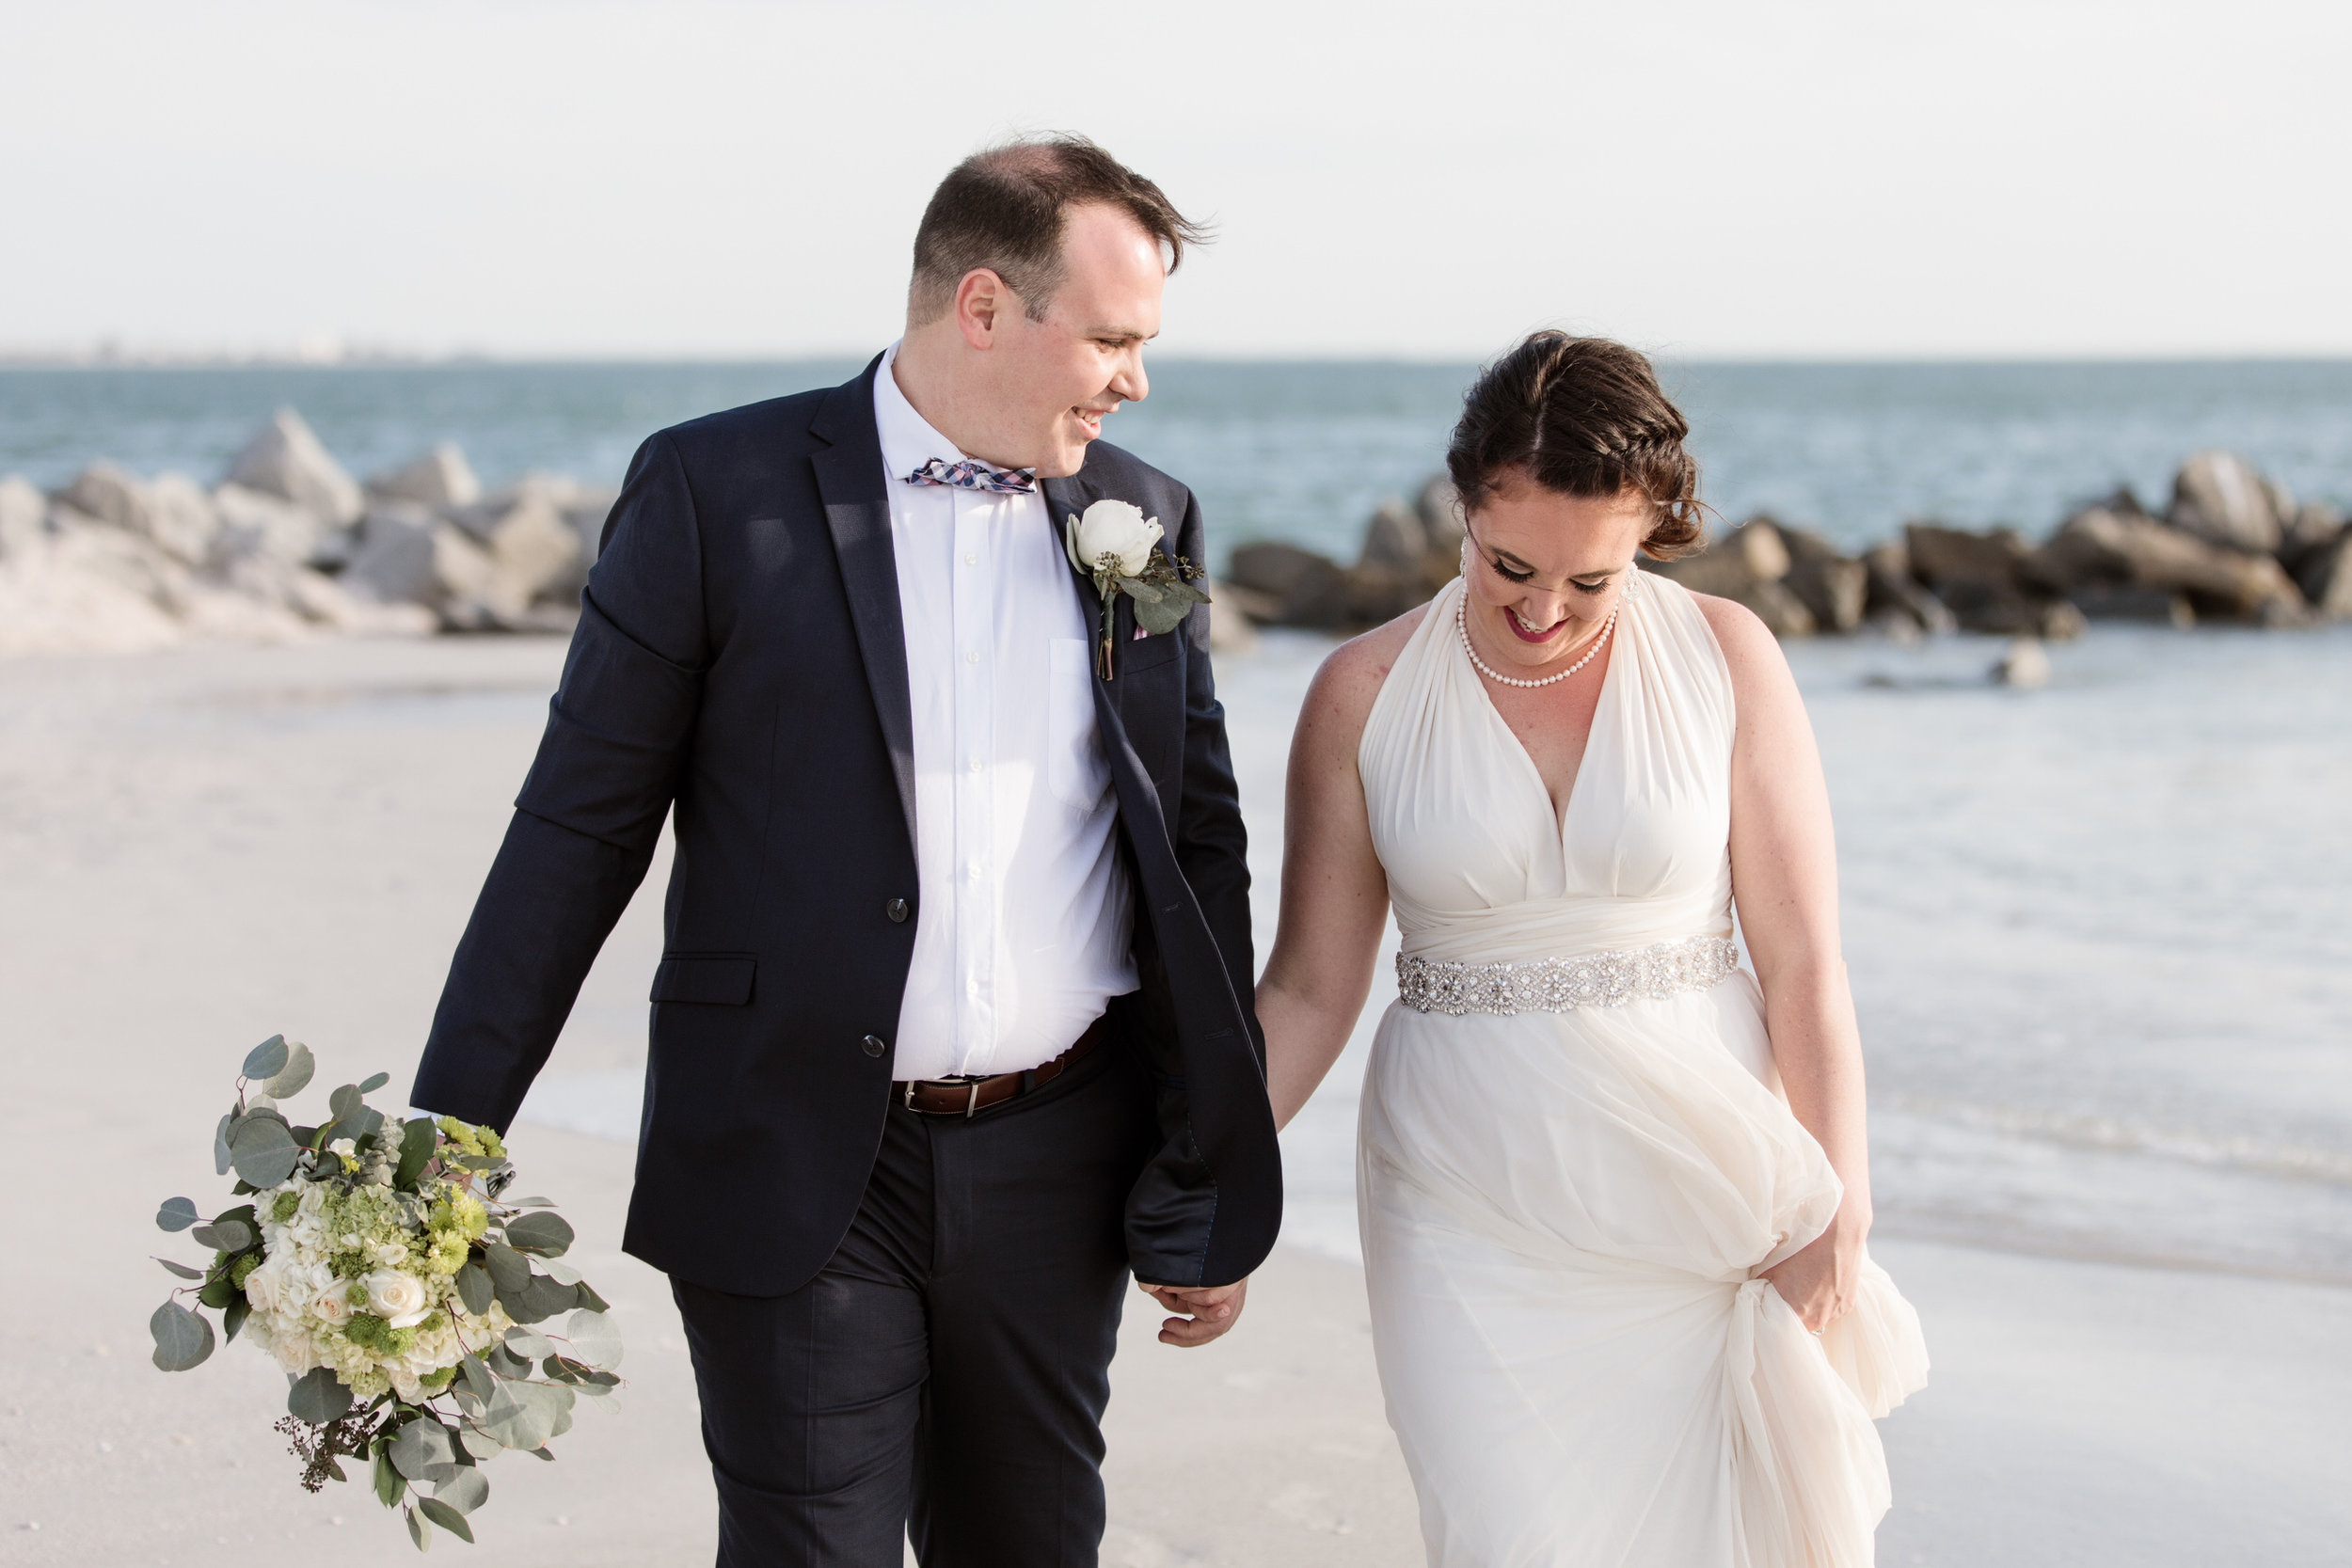 Beltran_Treasure_Island_Elopement_Tampa_Wedding_071-1.jpg